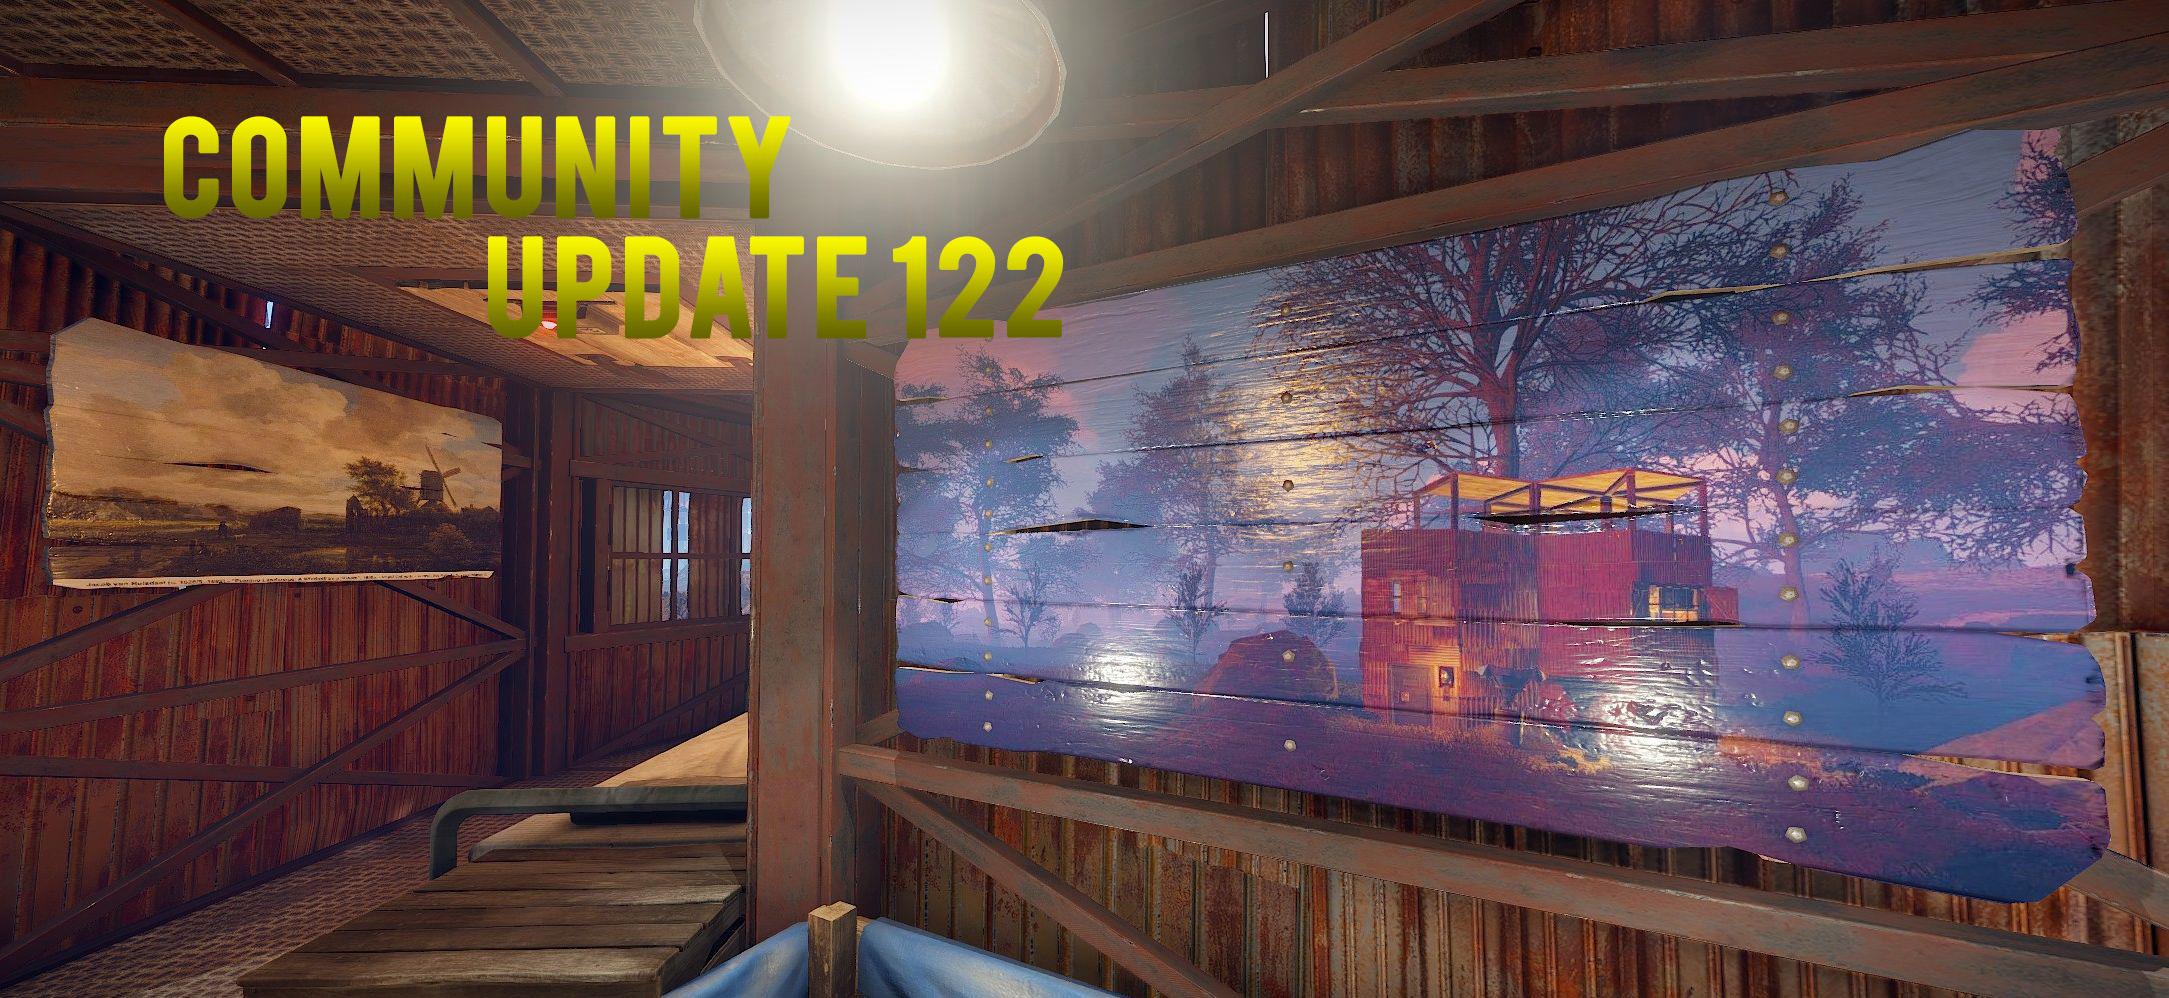 Community Update 122